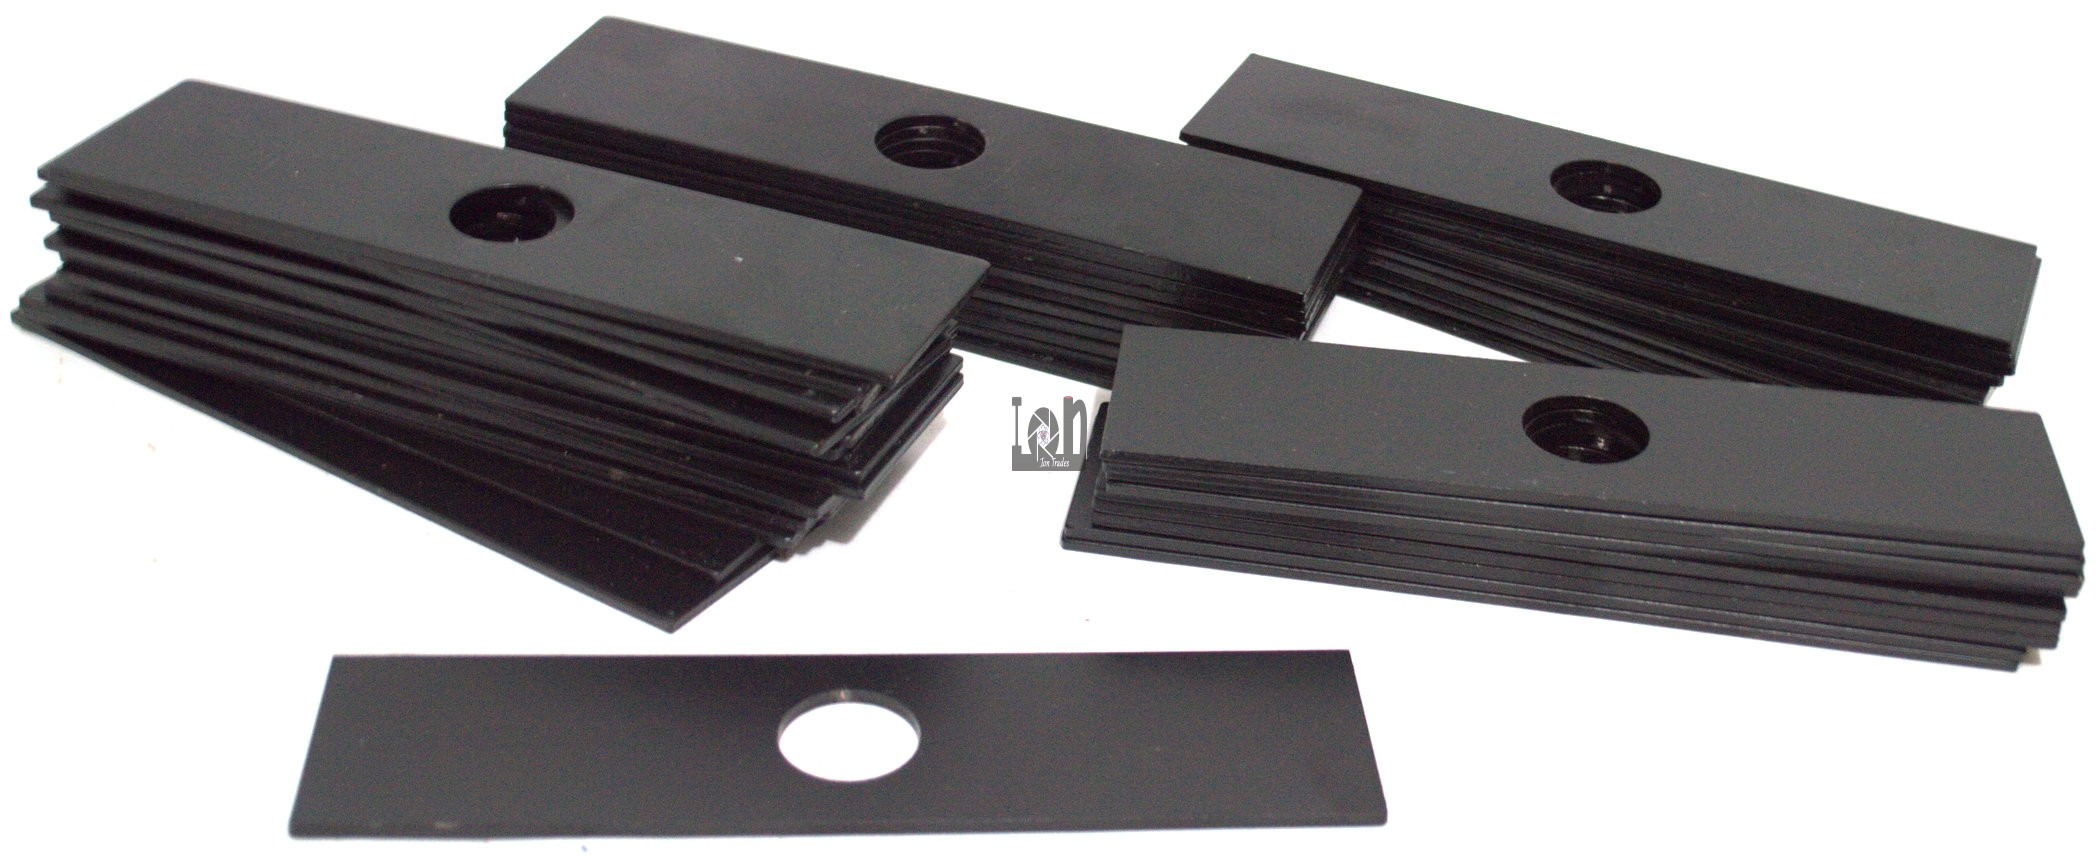 "10pk 7-3/4"" x 2"" x 1"" Bore Edger Blades 358.79649 301272 Stihl Craftsman Ryobi Parts"